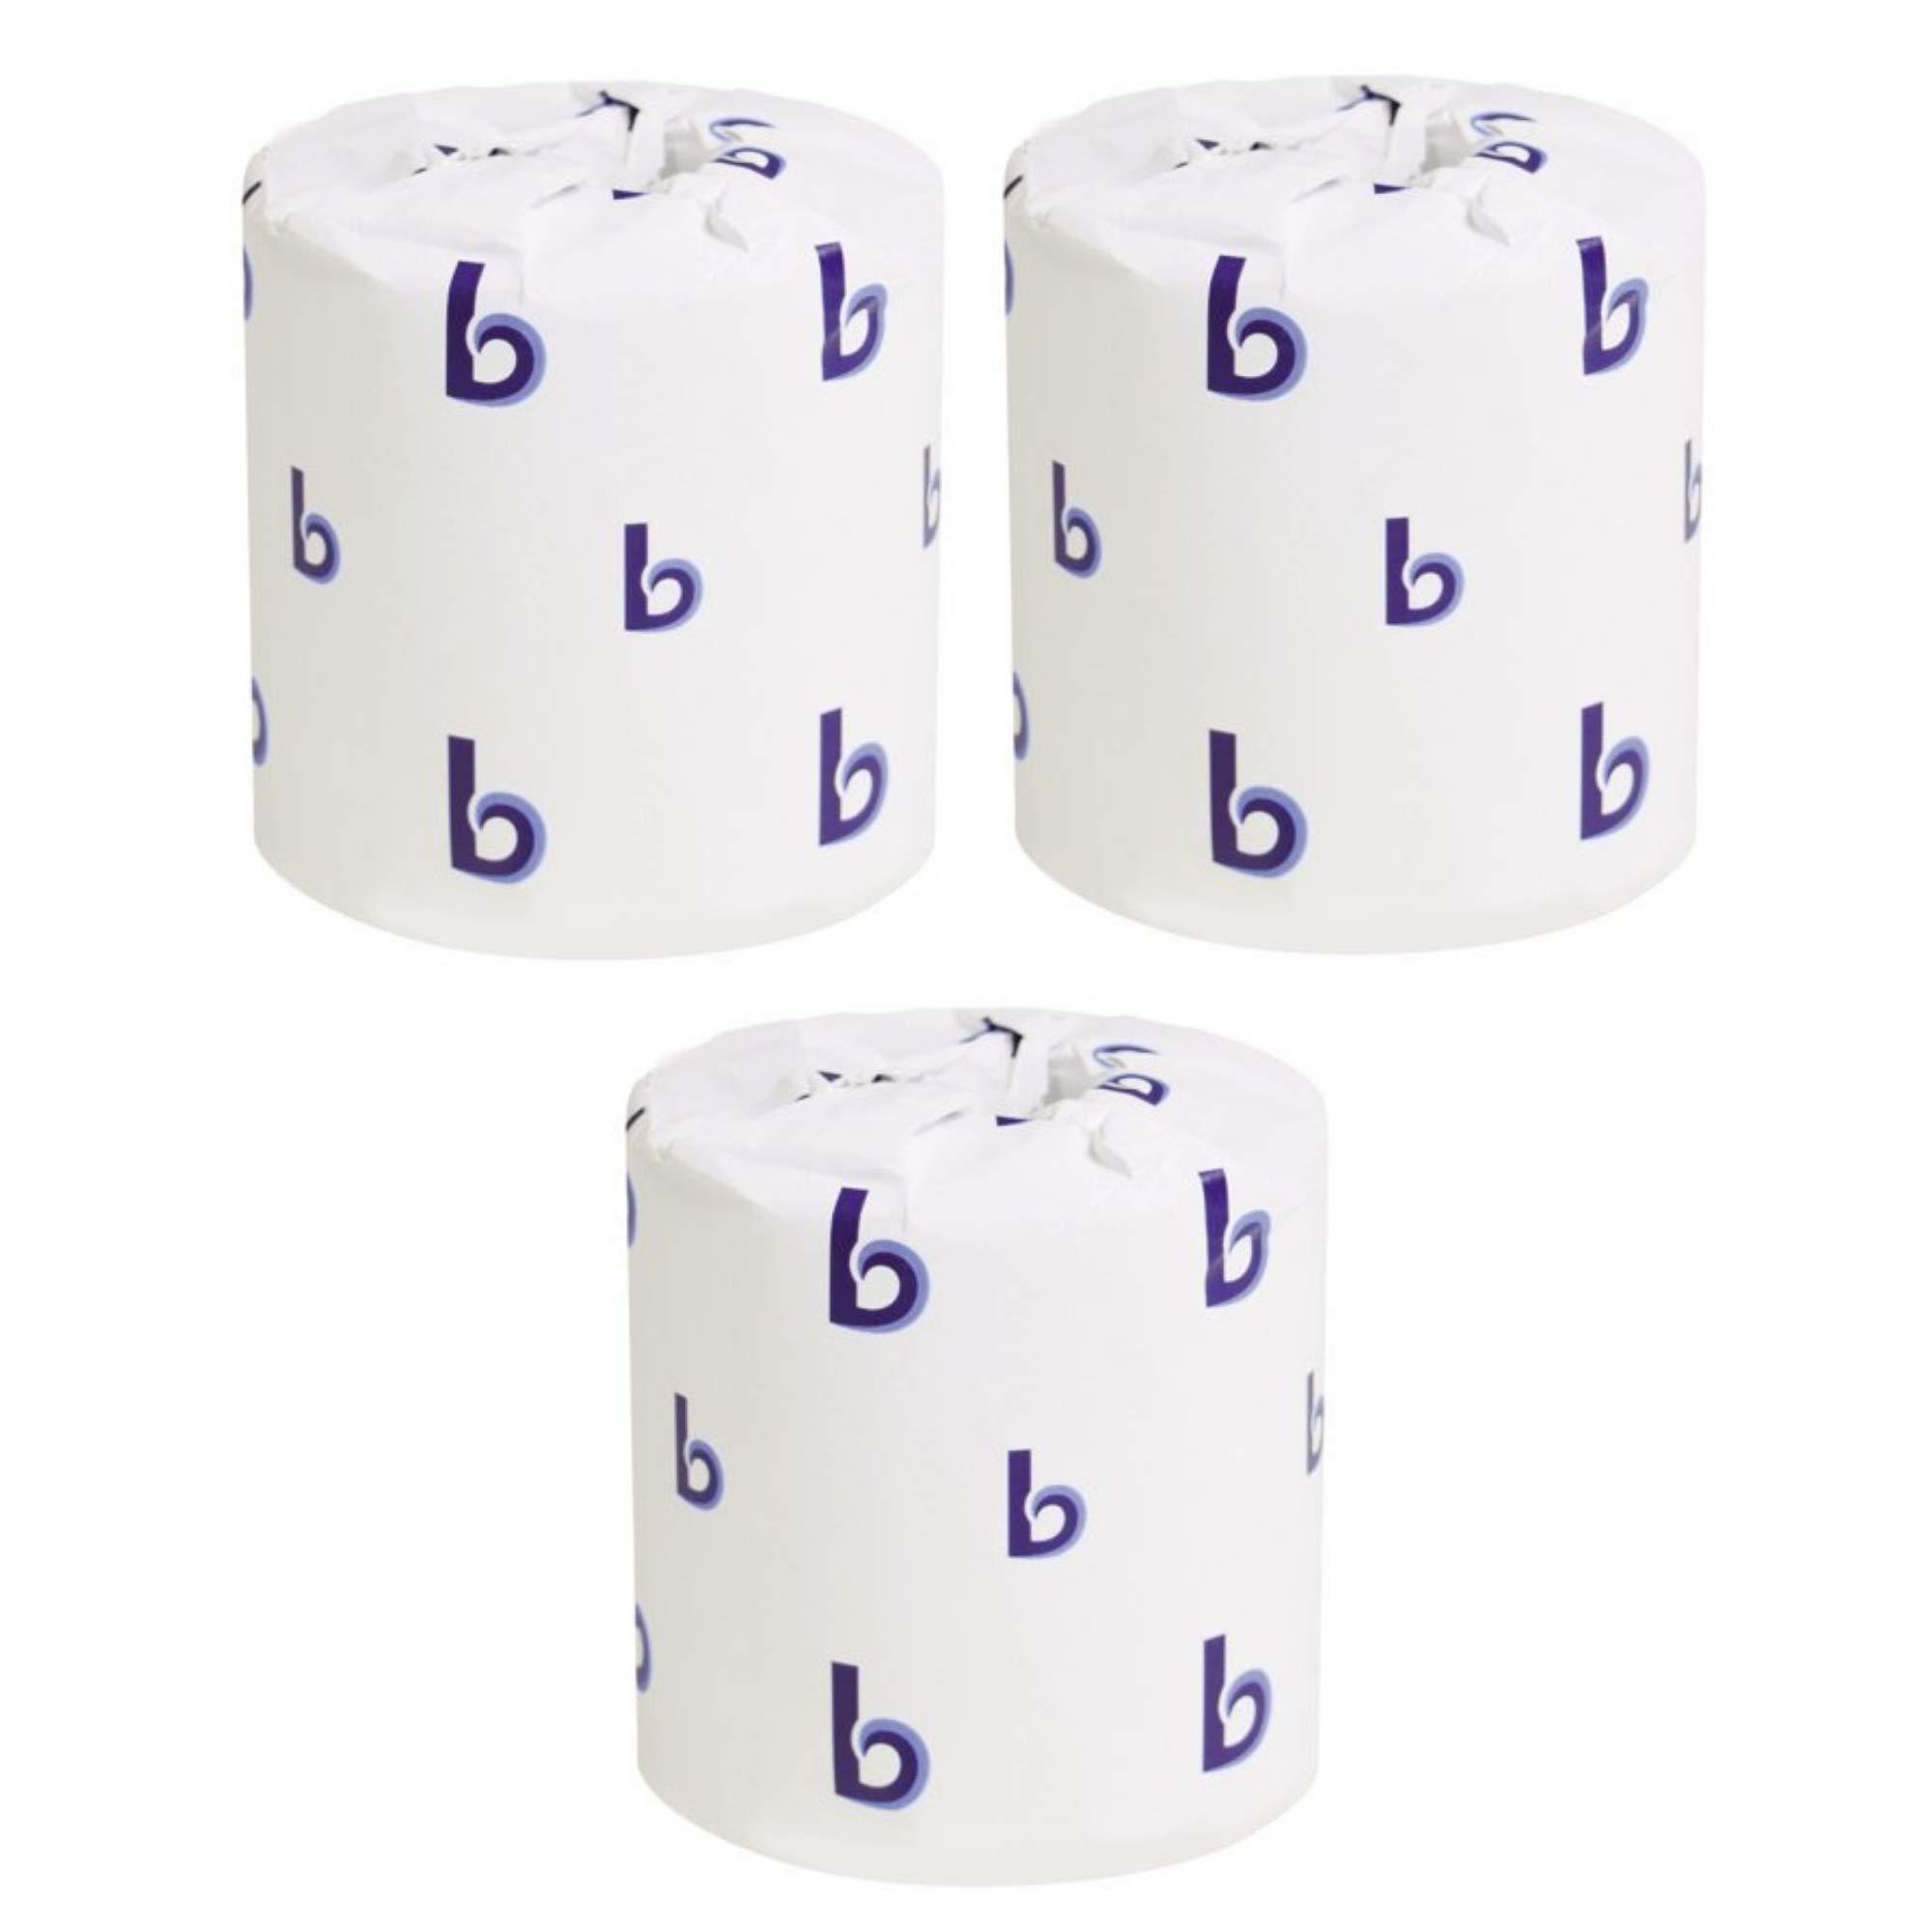 Boardwalk 6180 Two-Ply Toilet Tissue, White, 4 1/2 x 3 Sheet, 500 Sheets Per Roll (Case of 96 Rolls) - 3 Packs